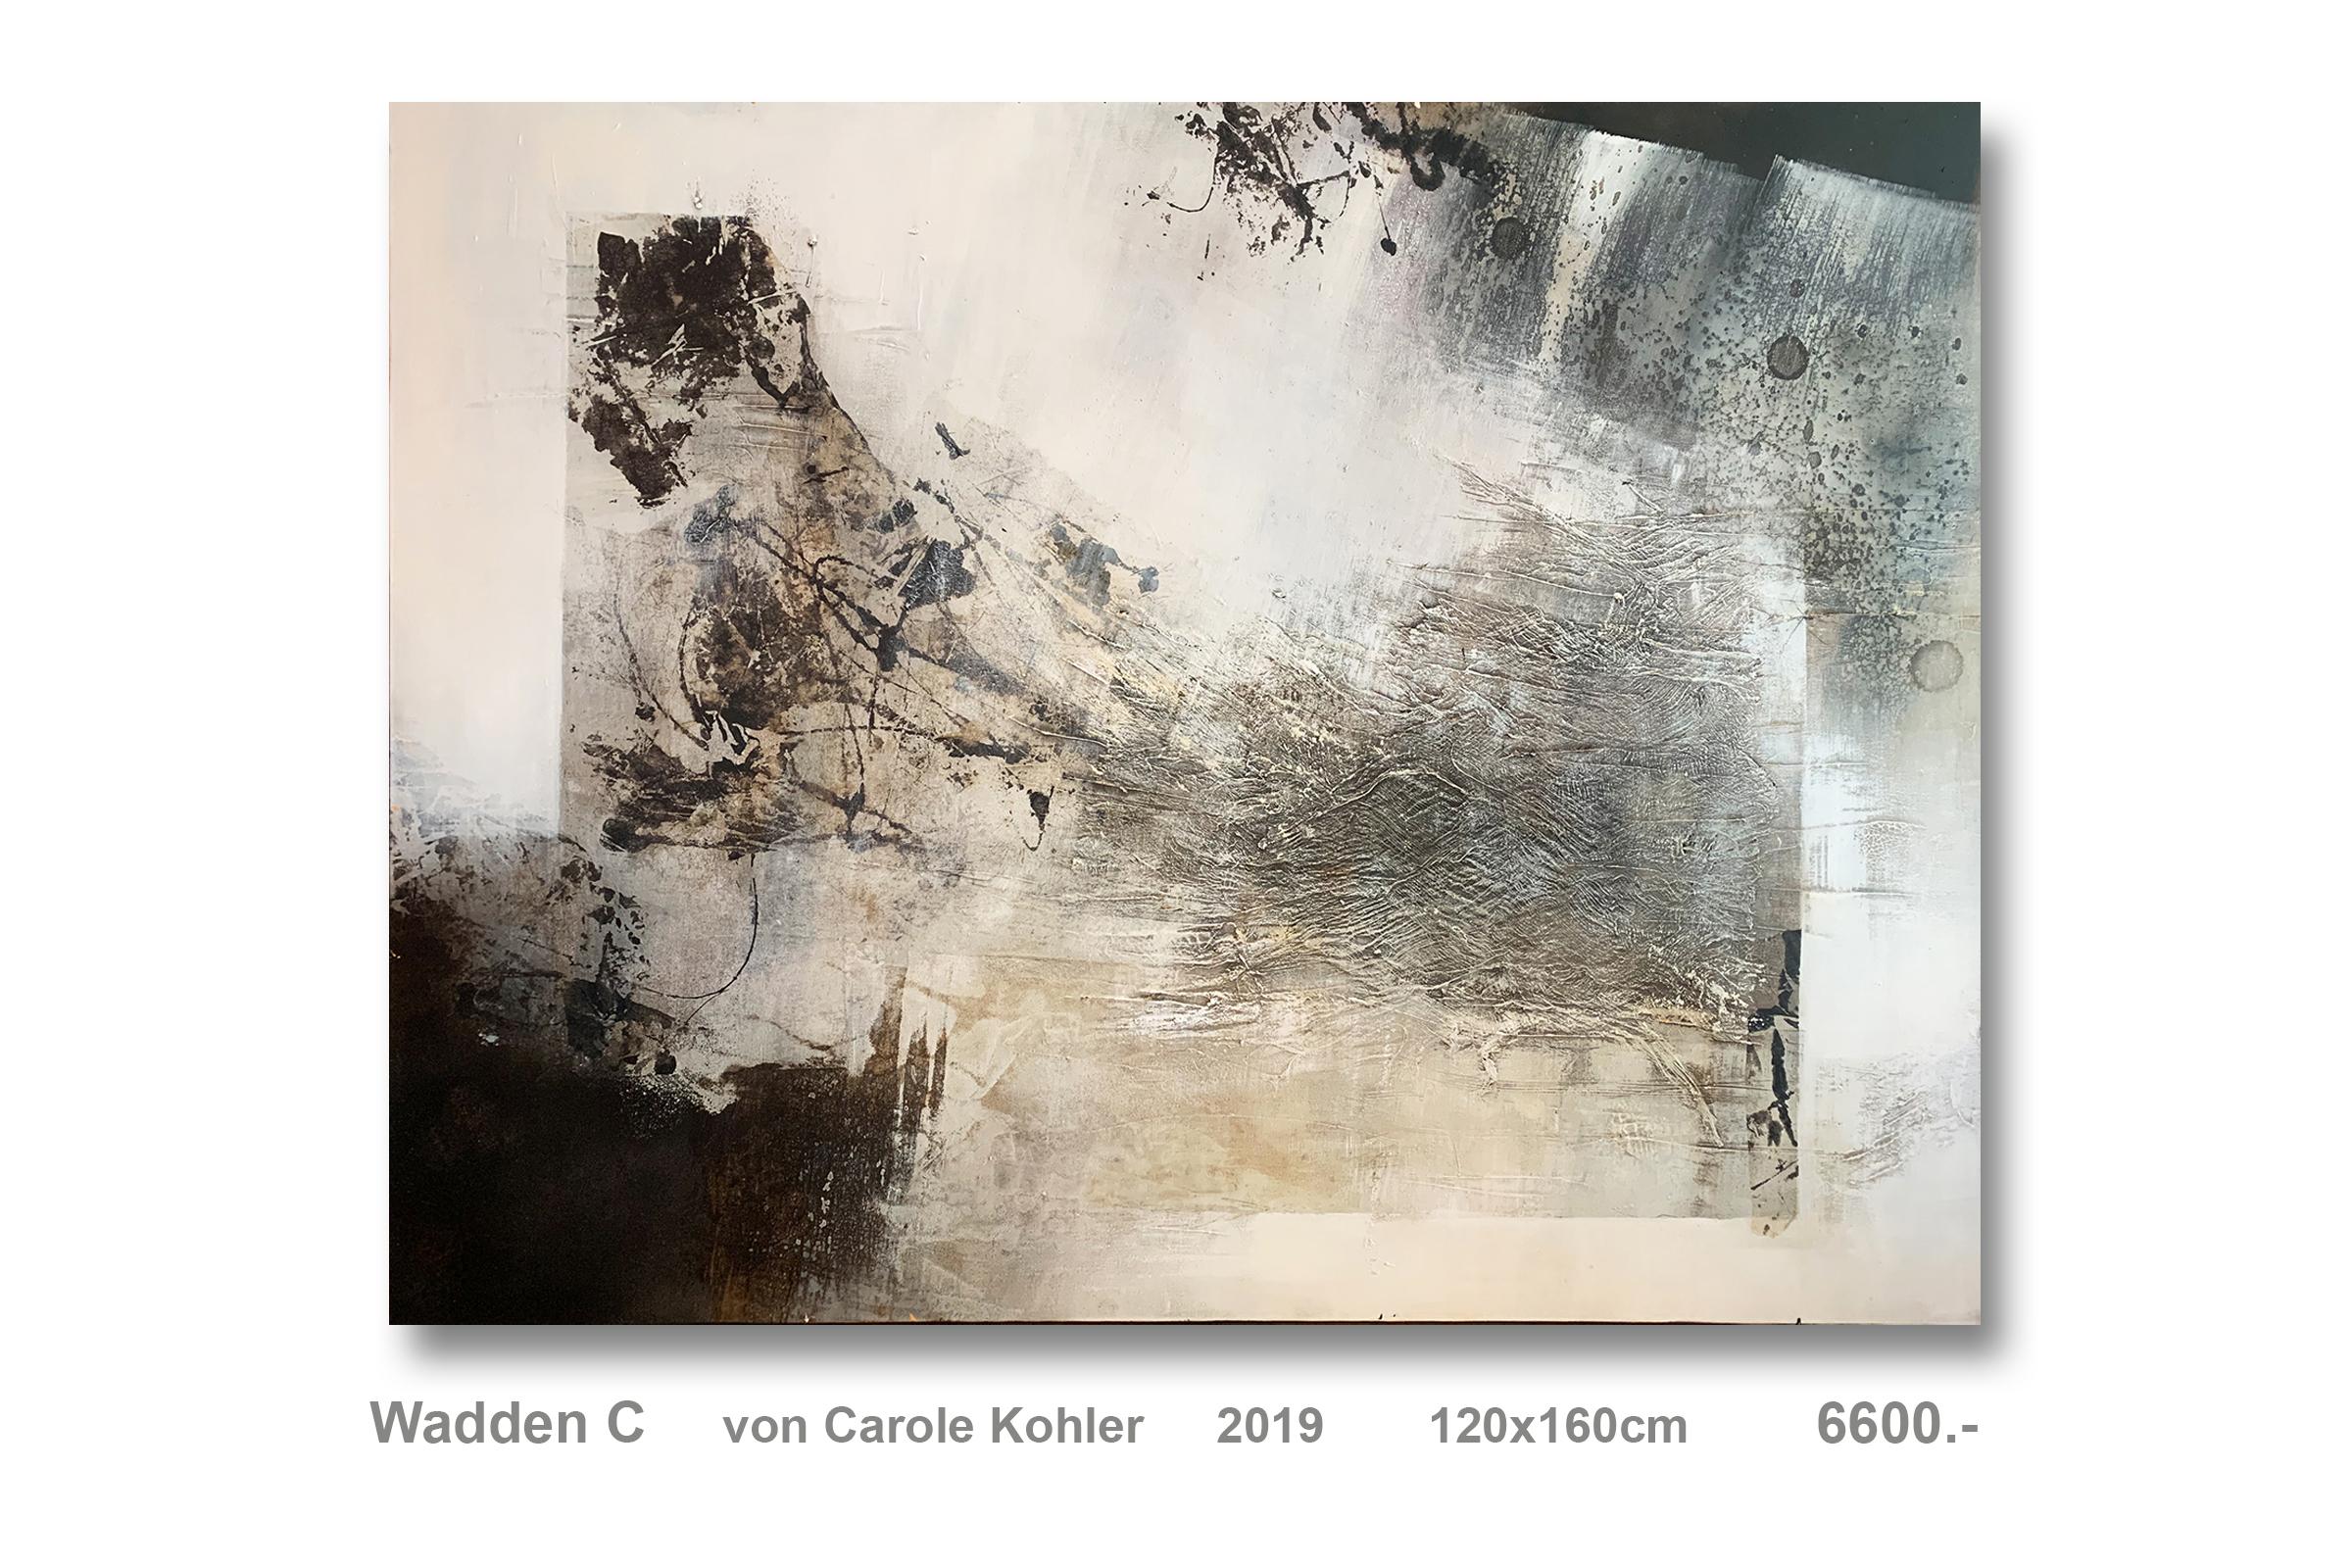 Wadden C